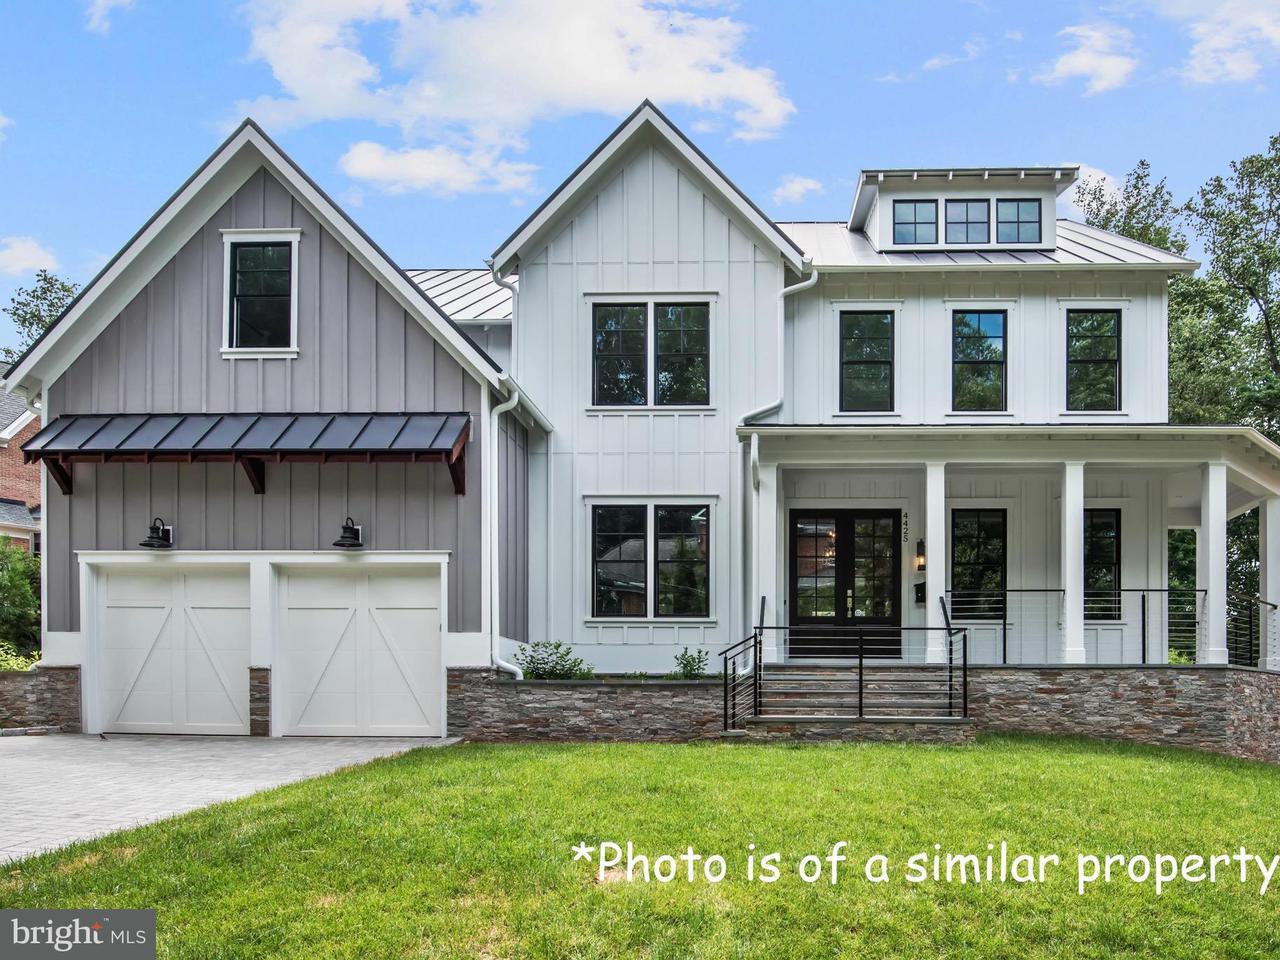 Single Family Home for Sale at 4101 RICHMOND ST N 4101 RICHMOND ST N Arlington, Virginia 22207 United States